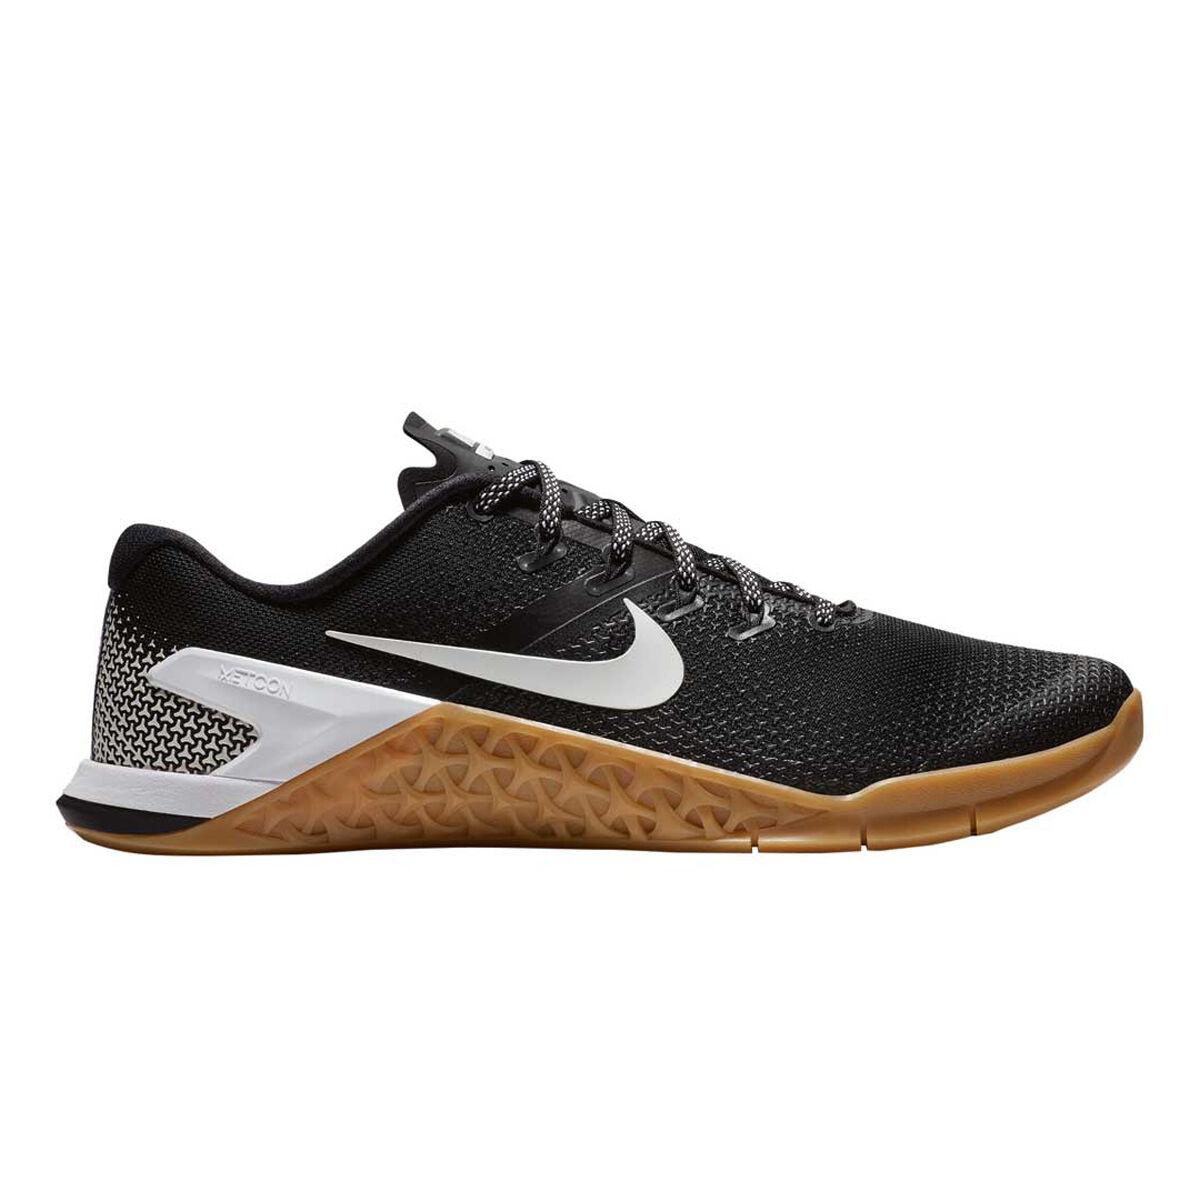 rebel metcon 4 Shop Clothing \u0026 Shoes Online